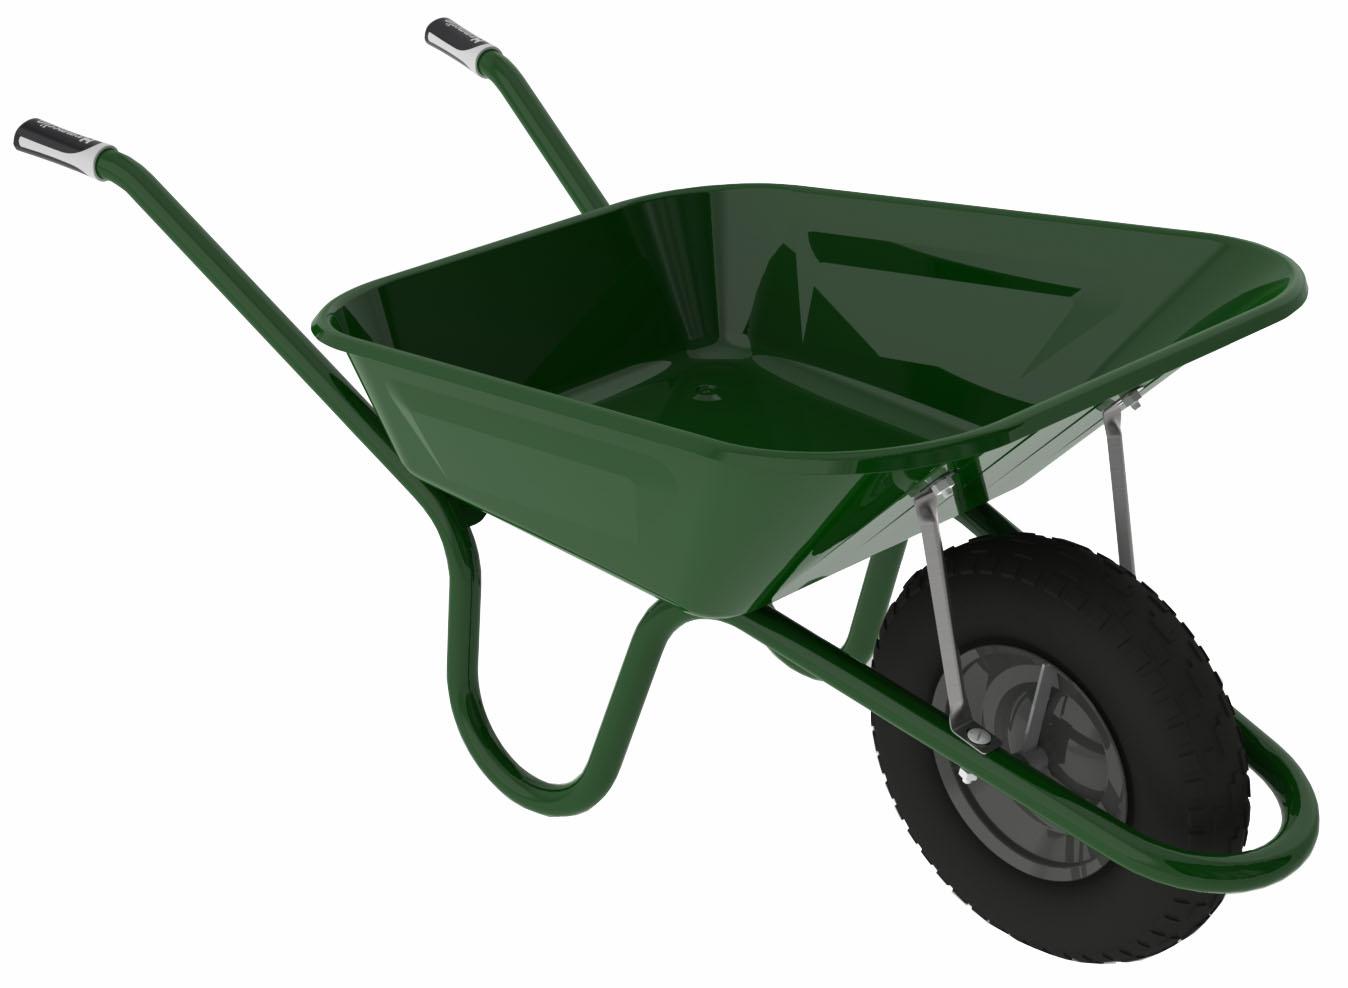 Wheelbarrow production plant barrow trolley handbarrow pushcart handcart cart garden cart